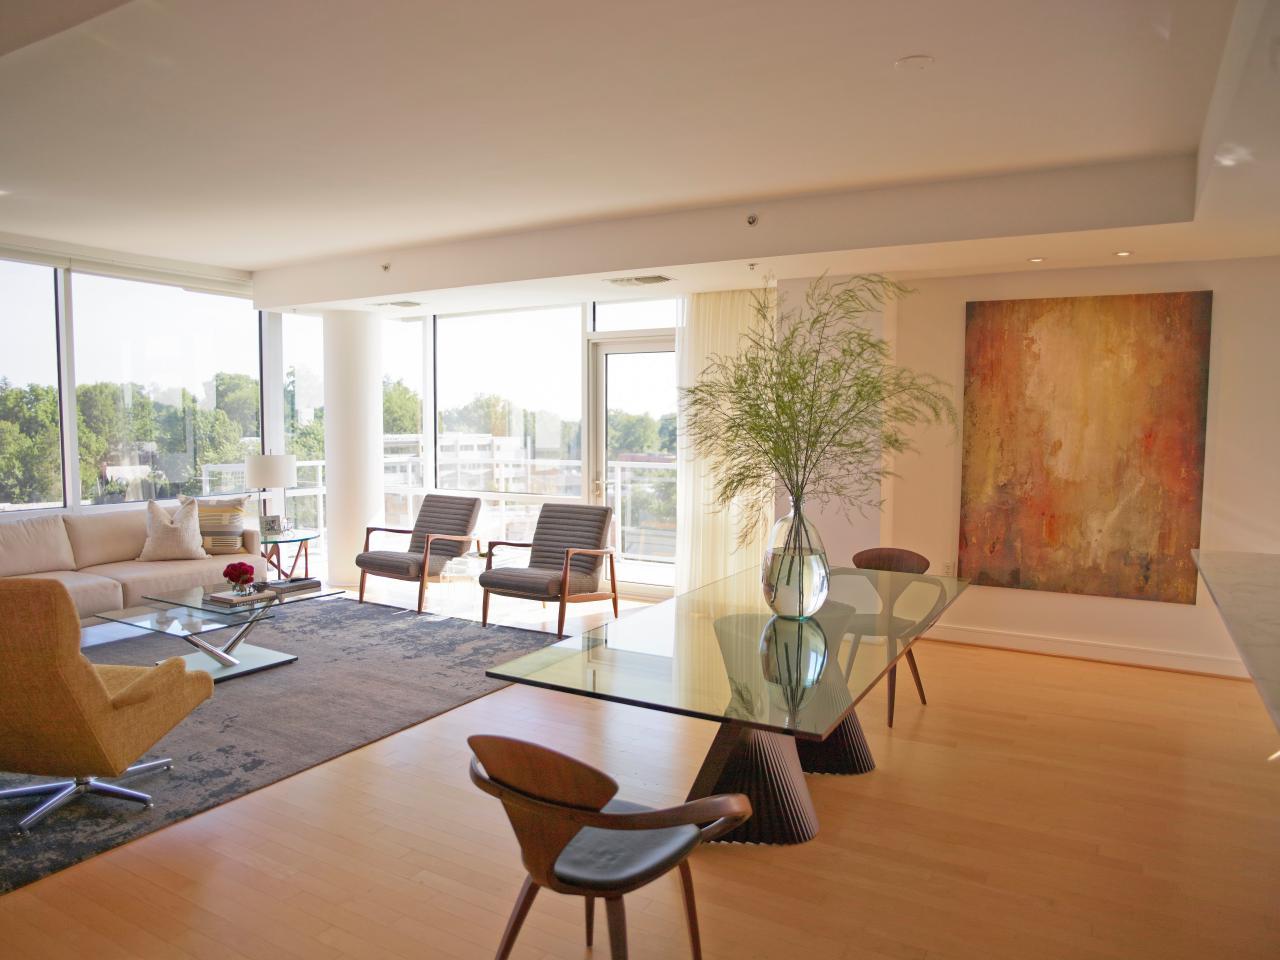 Luxury Modern Dining Room Design to Inspire You Luxury Modern Dining Room Design to Inspire You Luxury Modern Dining Room Design to Inspire You 08 1